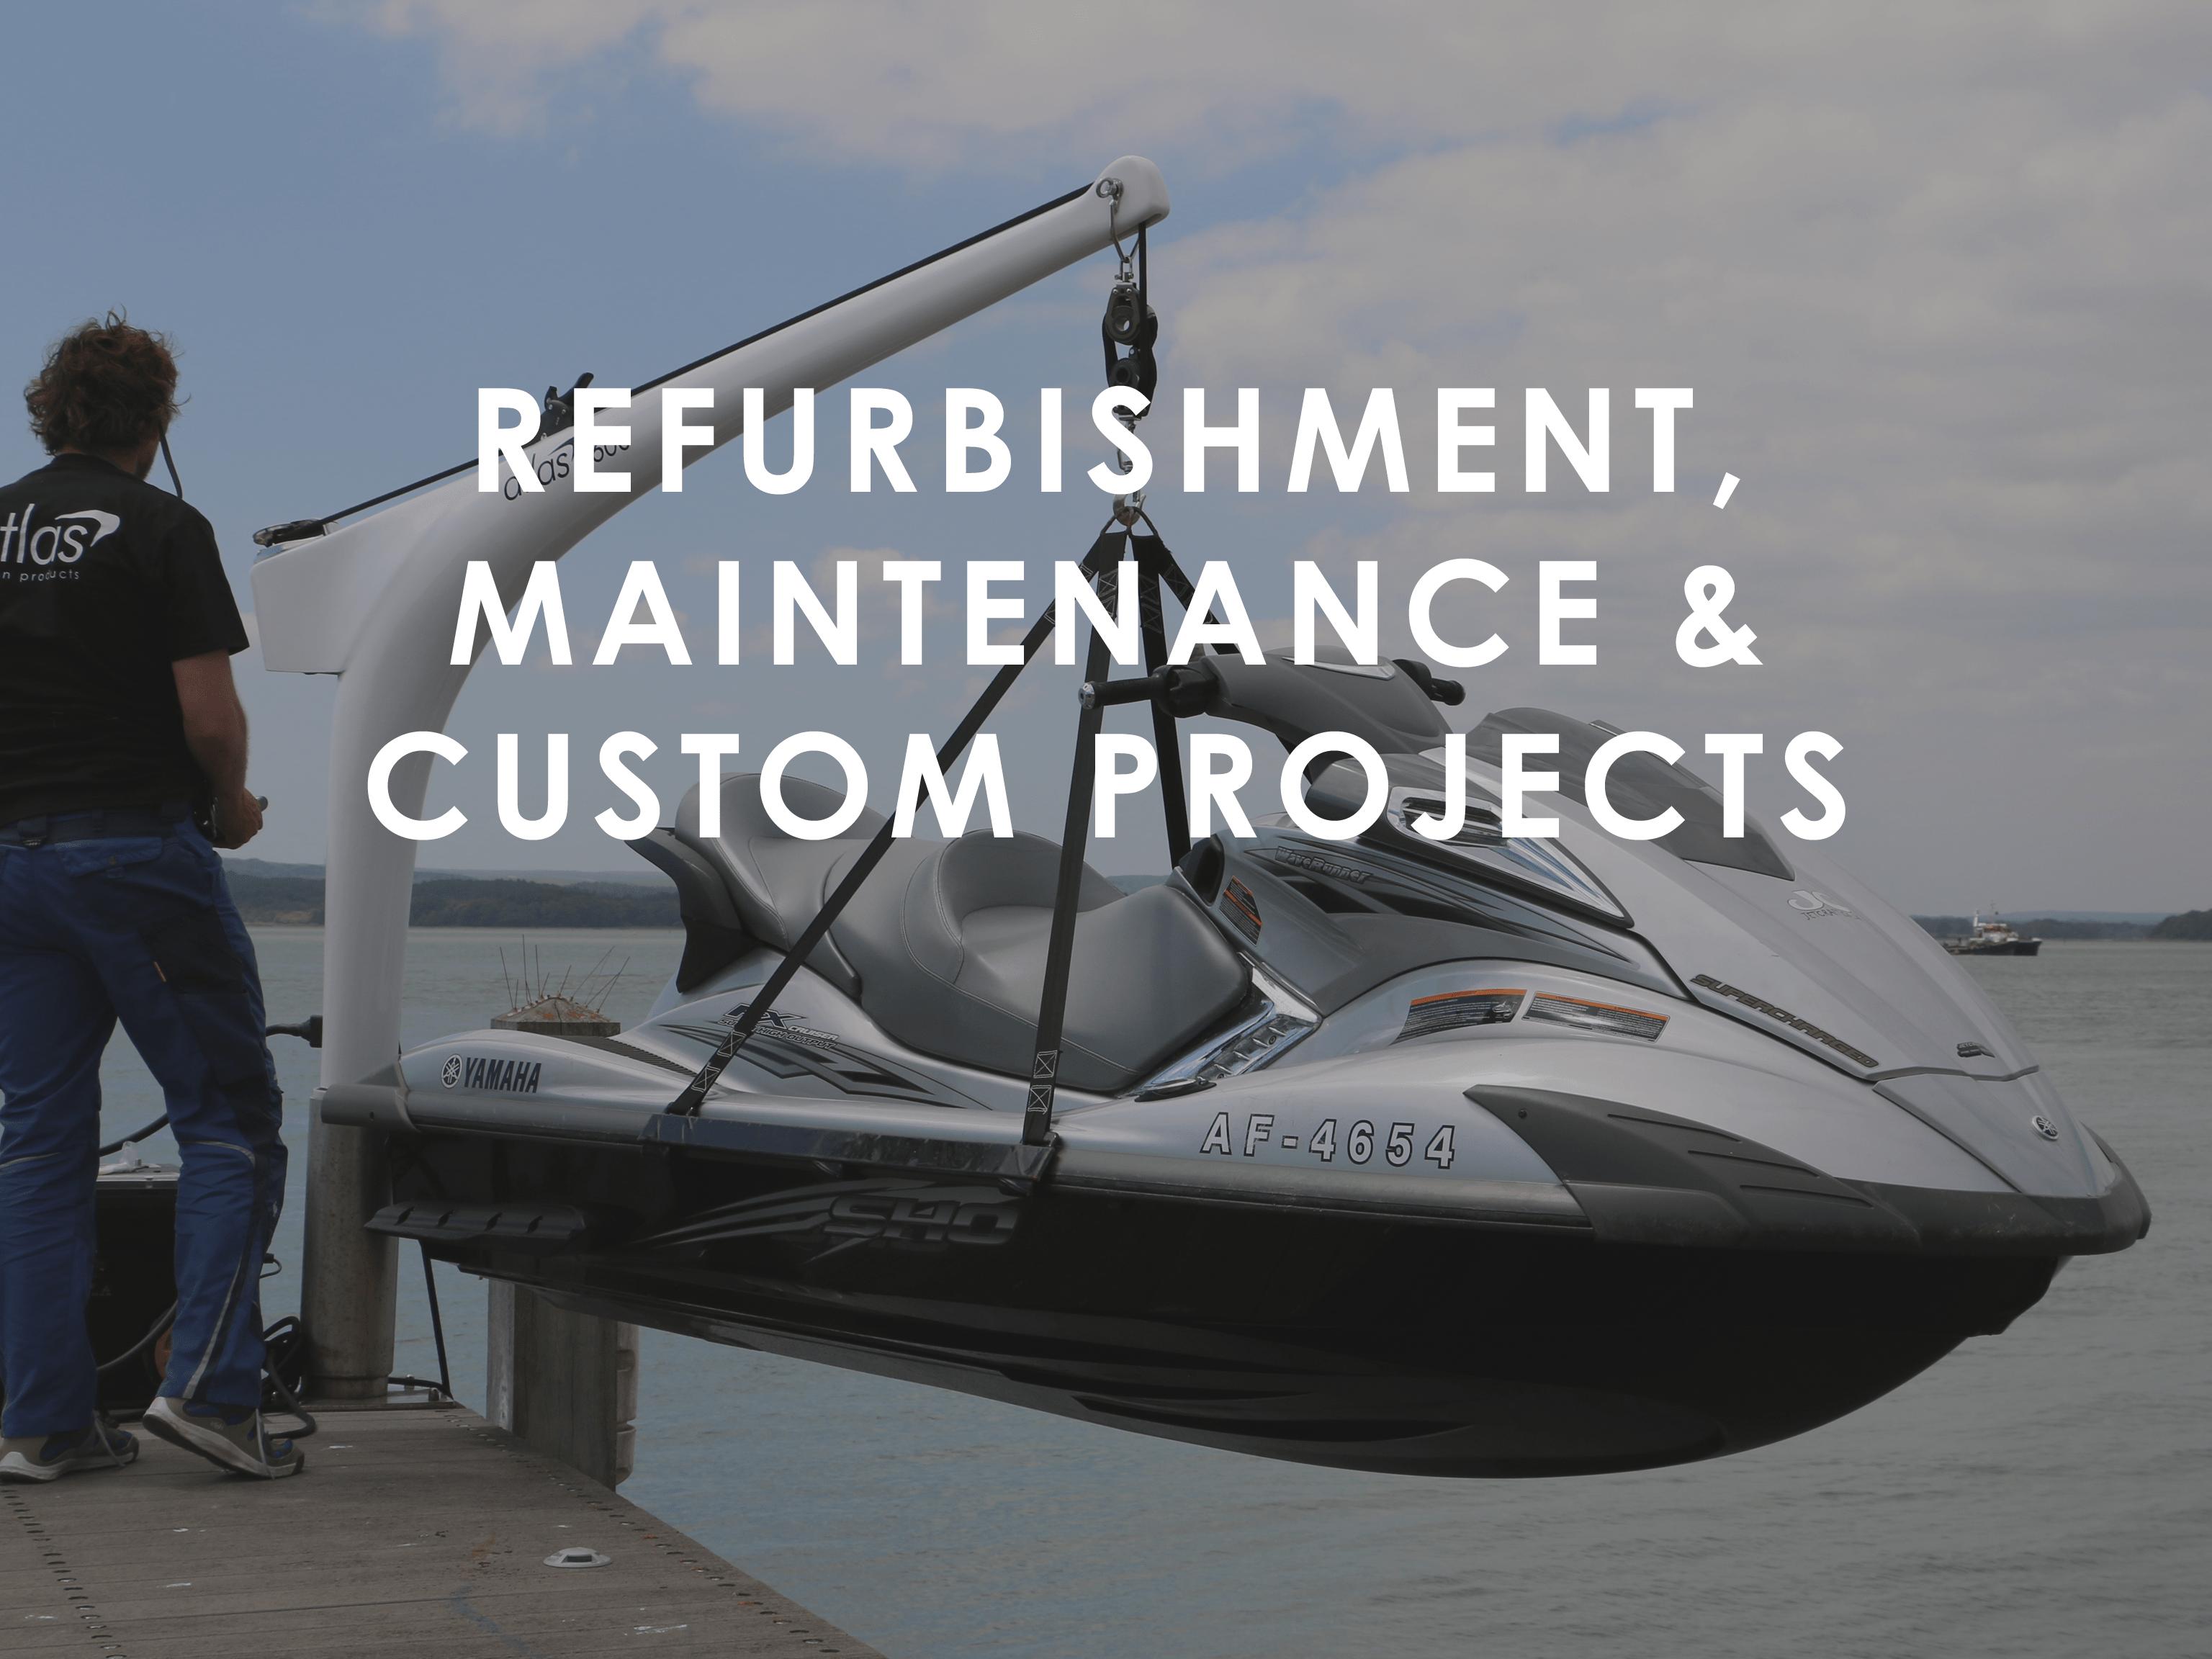 Atlas Carbon Products Maintenance & Refurbishment